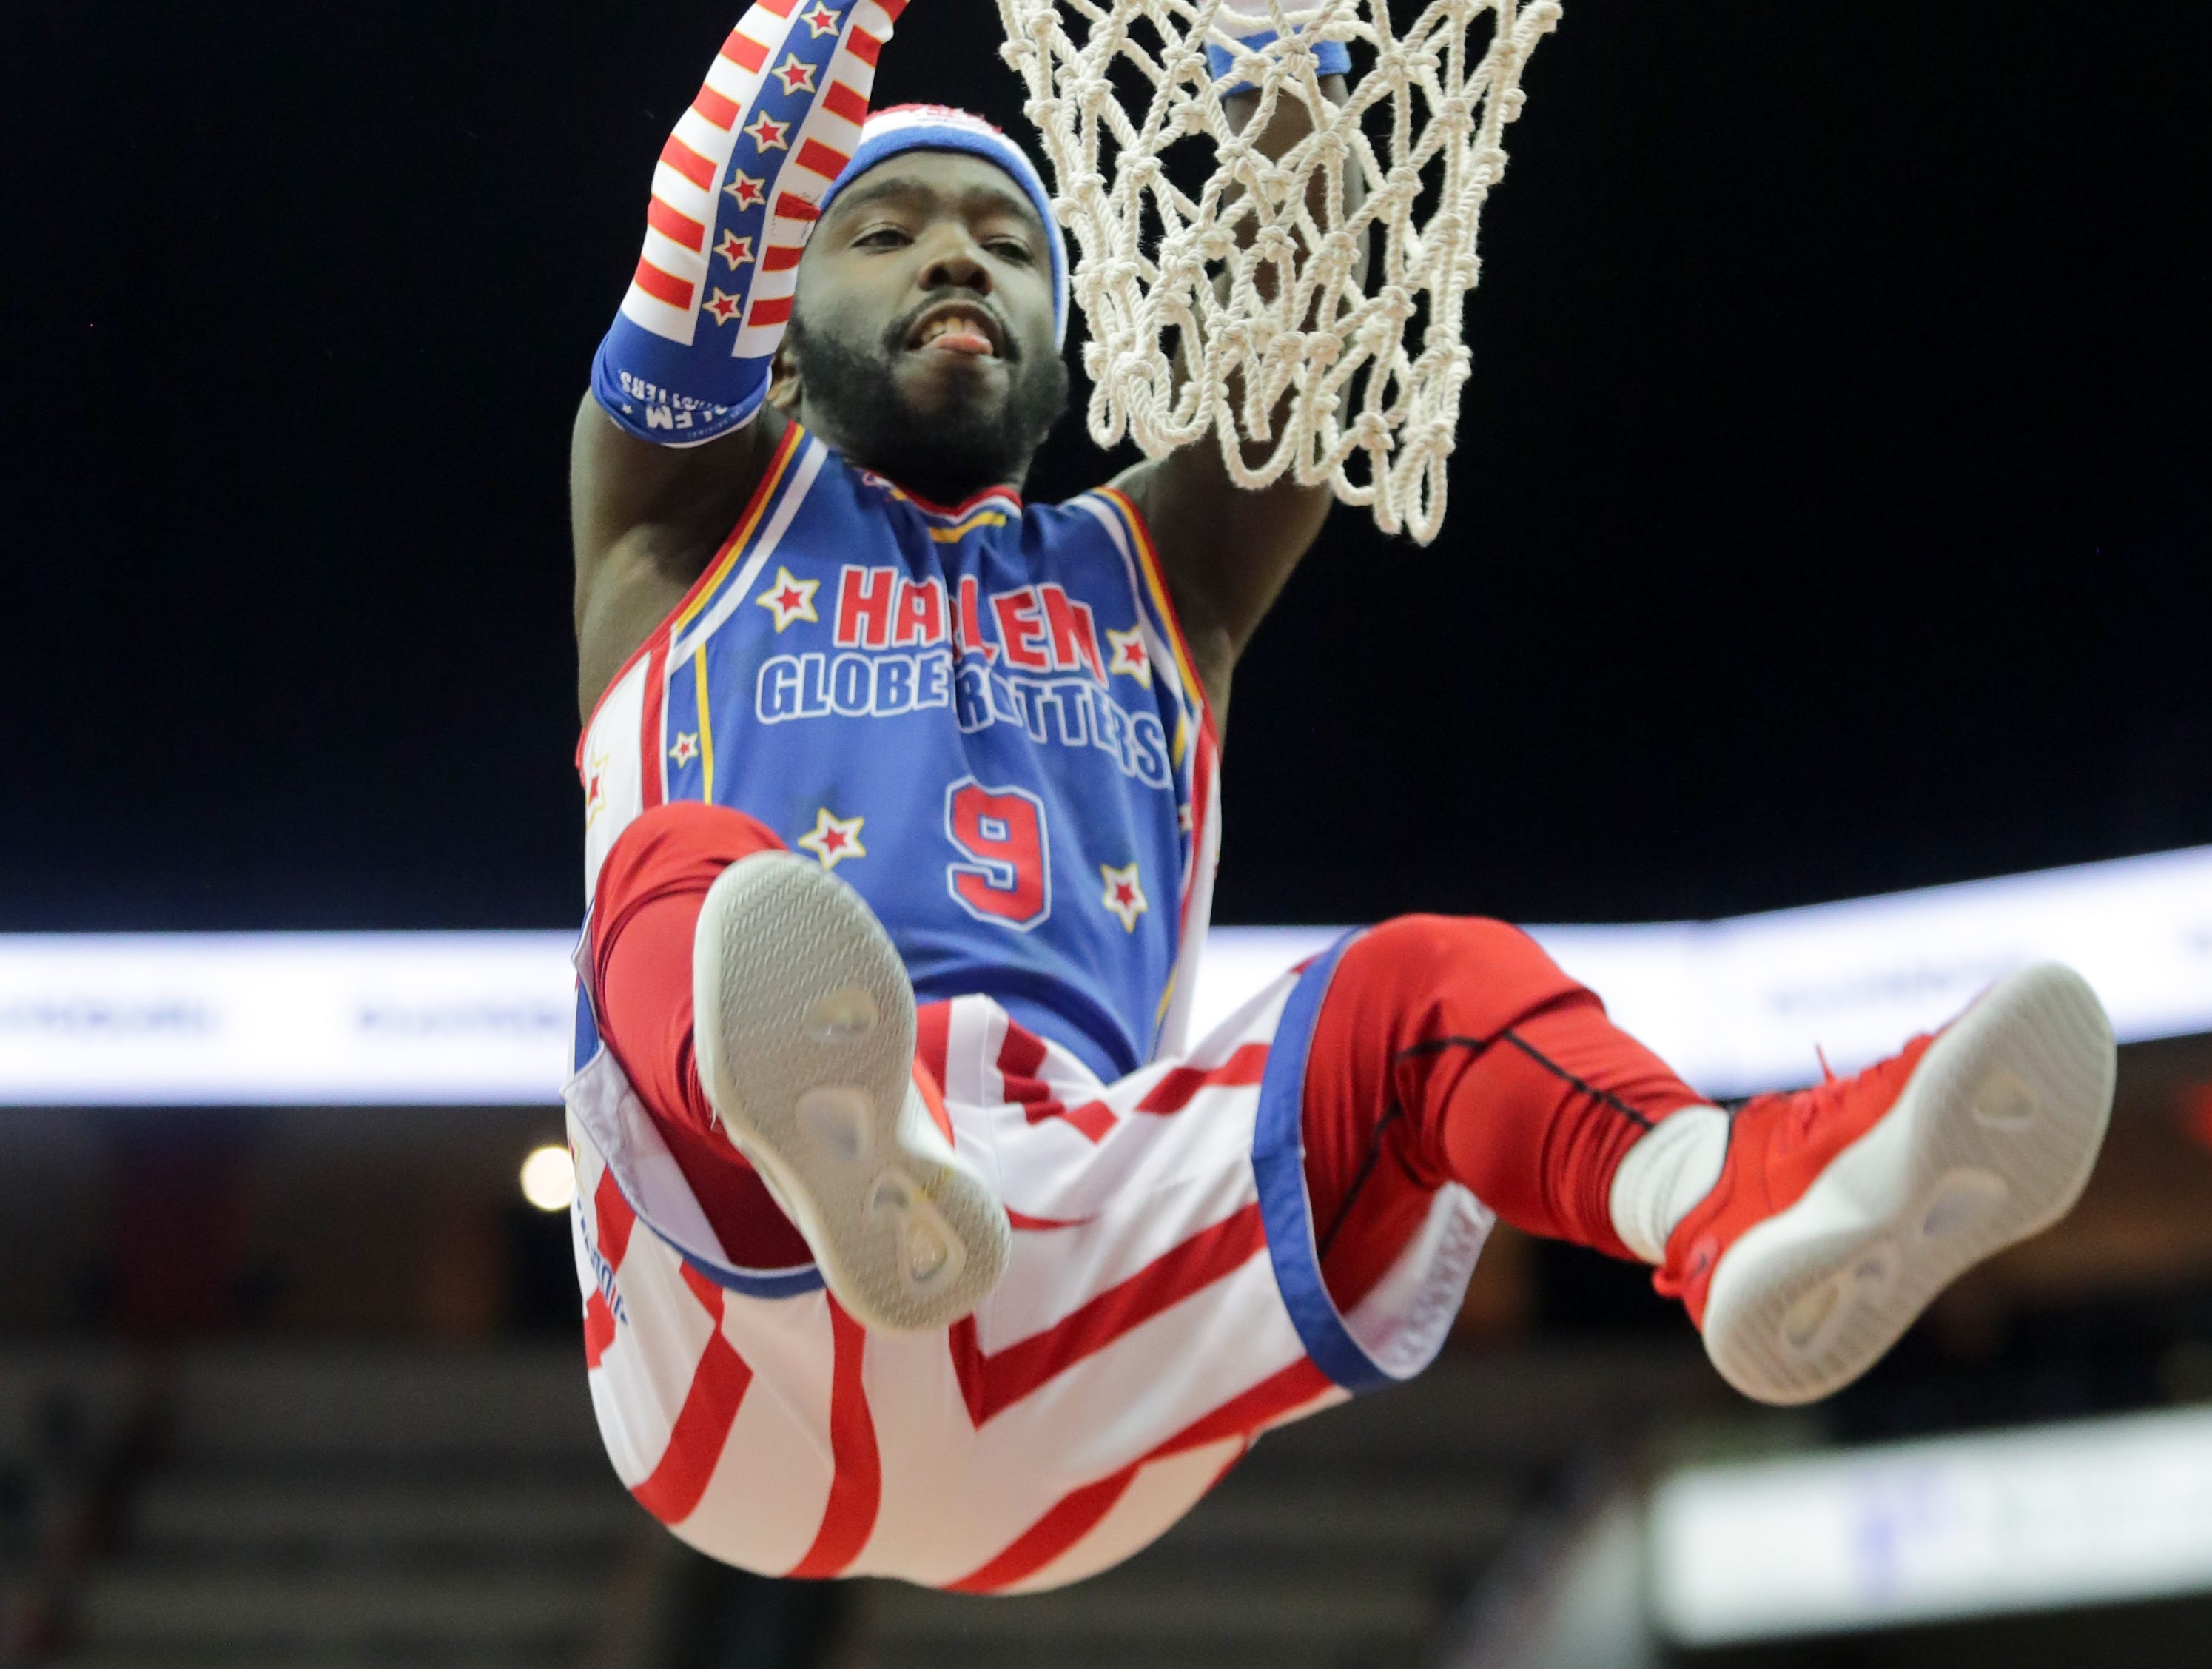 Harlem Globetrotters' Hot Shot with the dunk. Jan. 19, 2019